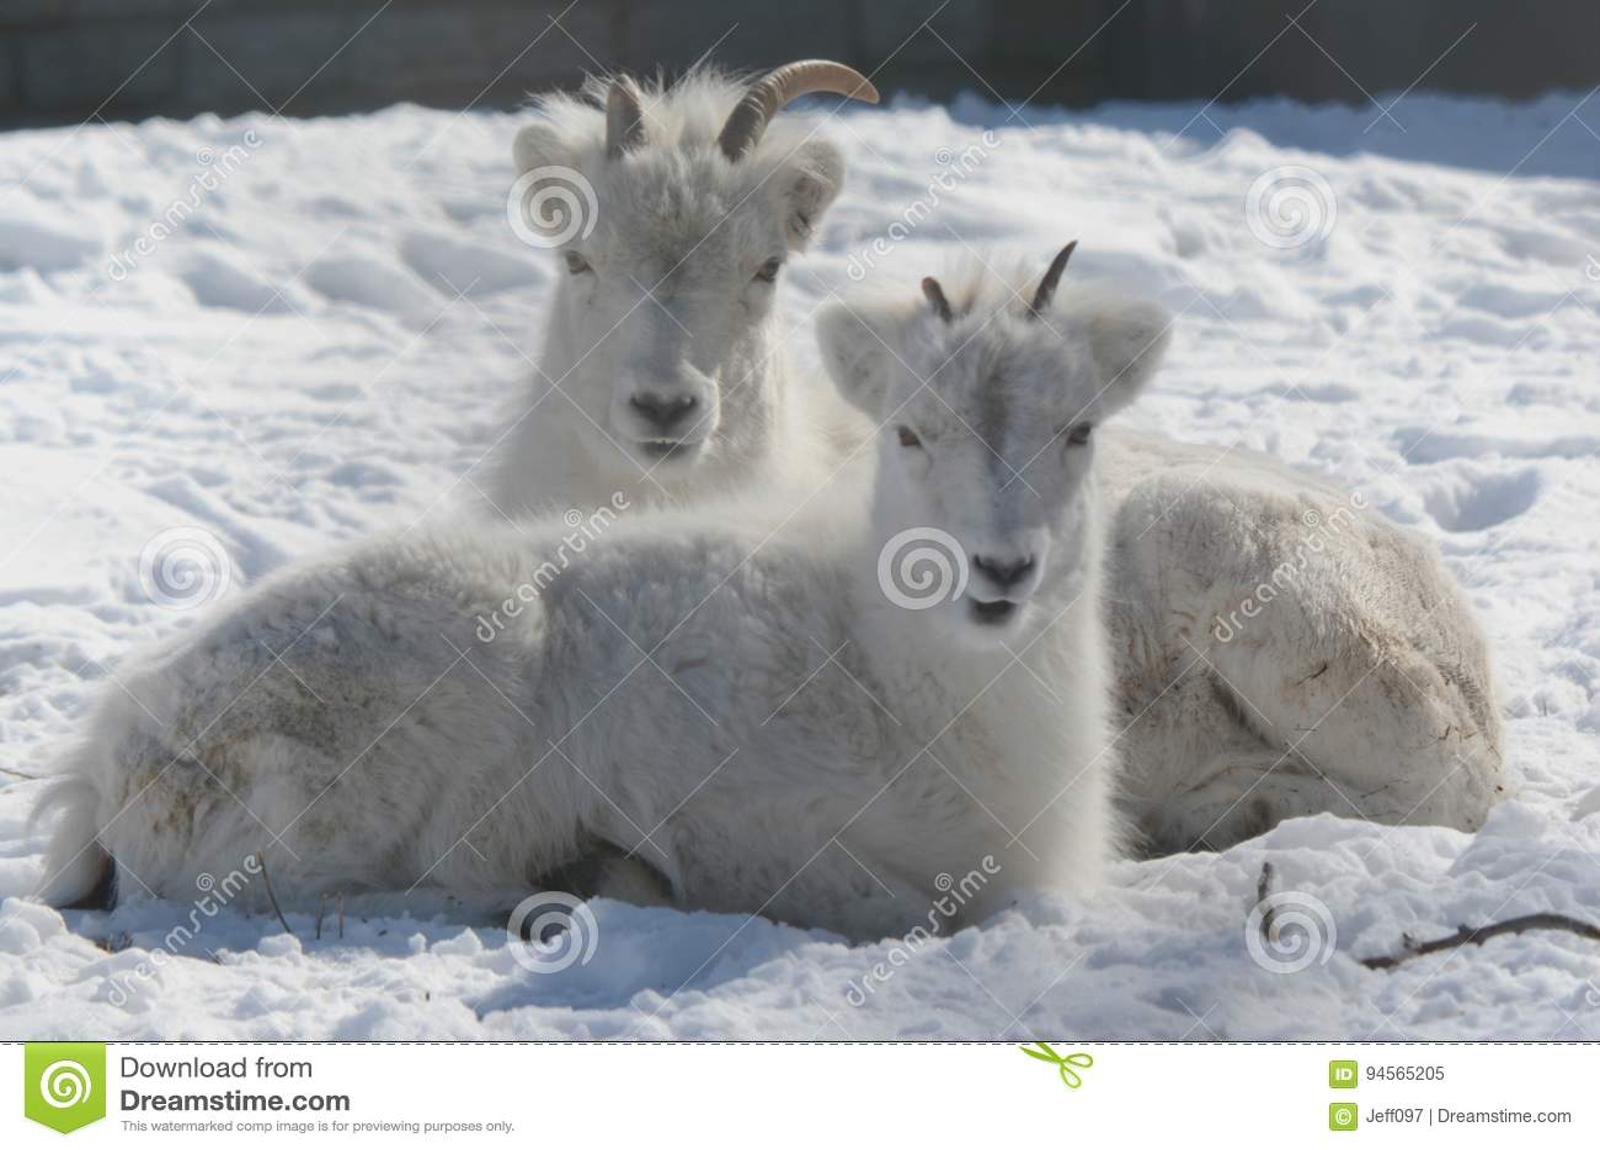 Winter Closeup Of Dall Sheep Ewe And Lamb